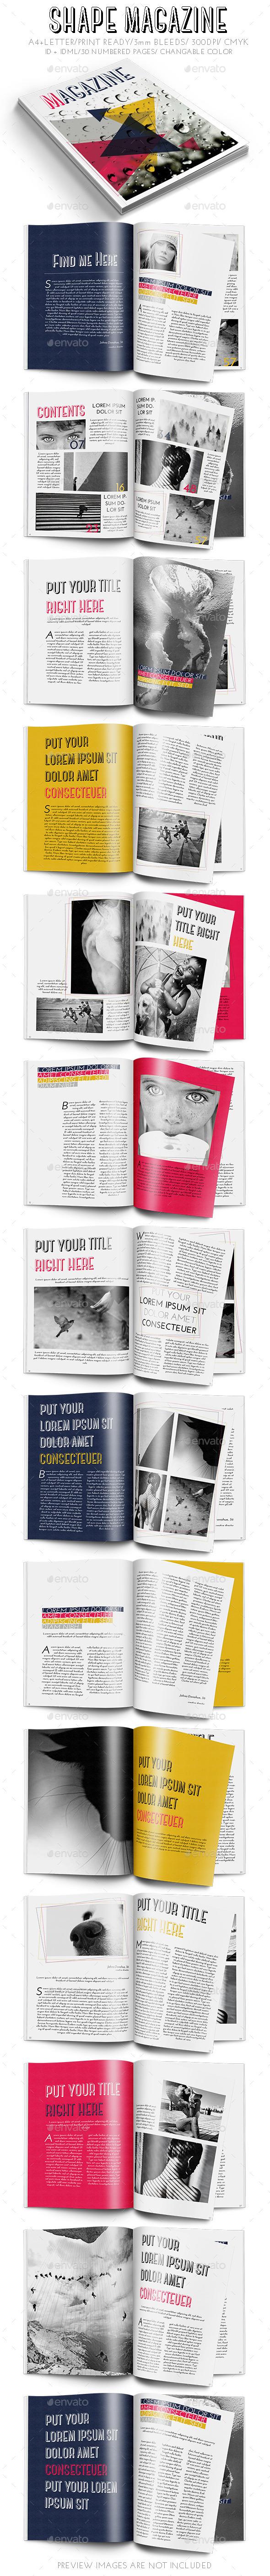 GraphicRiver Shape Magazine 9629787